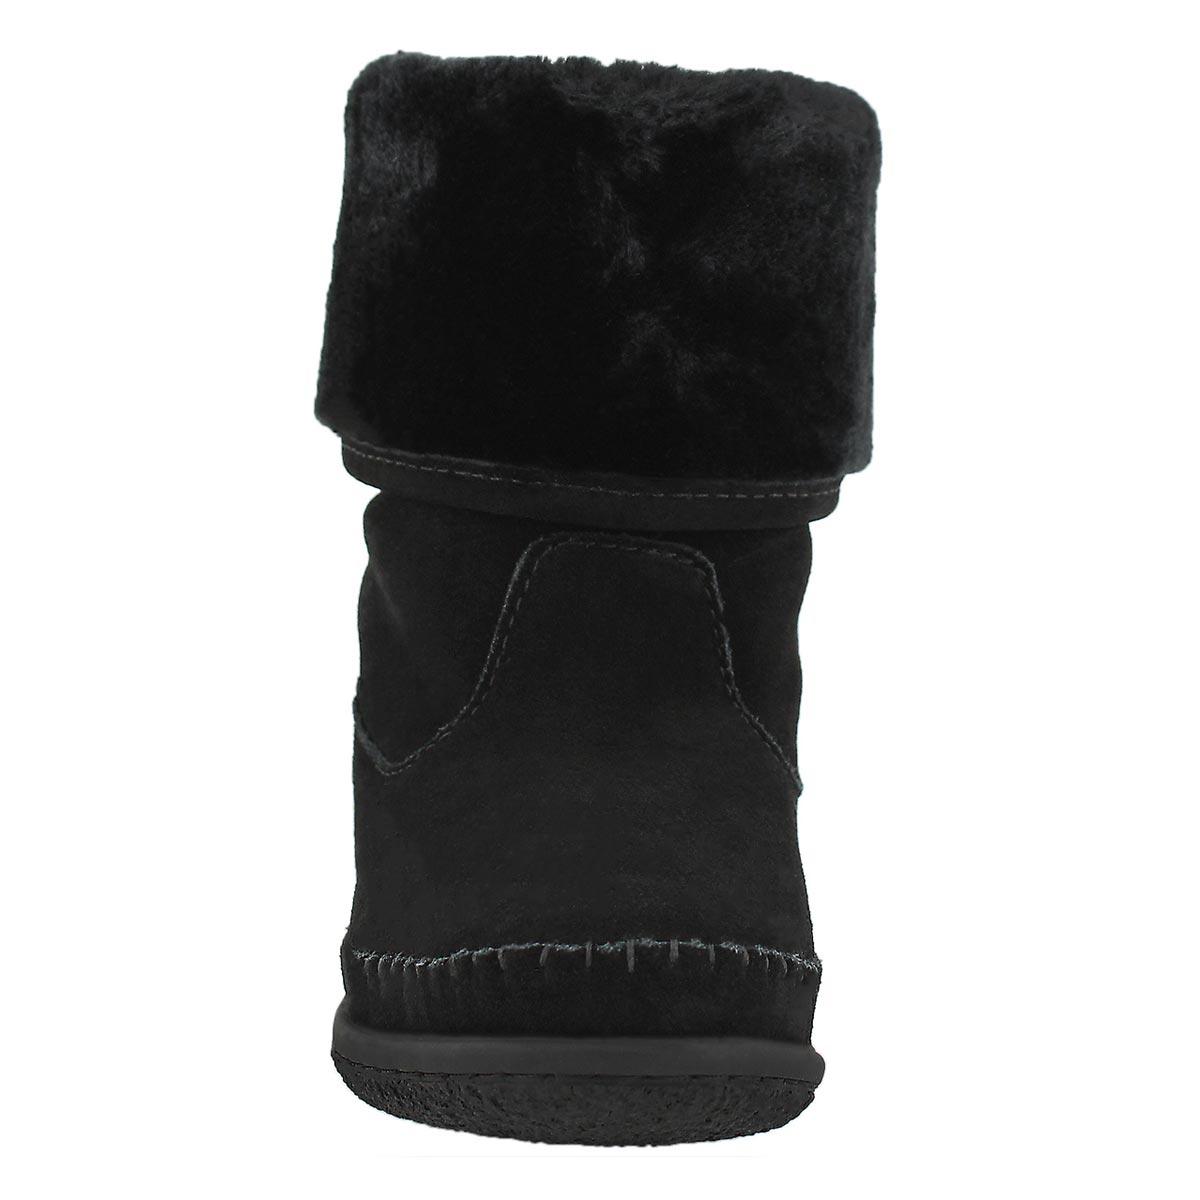 Lds Carolina black foldover mukluk boot